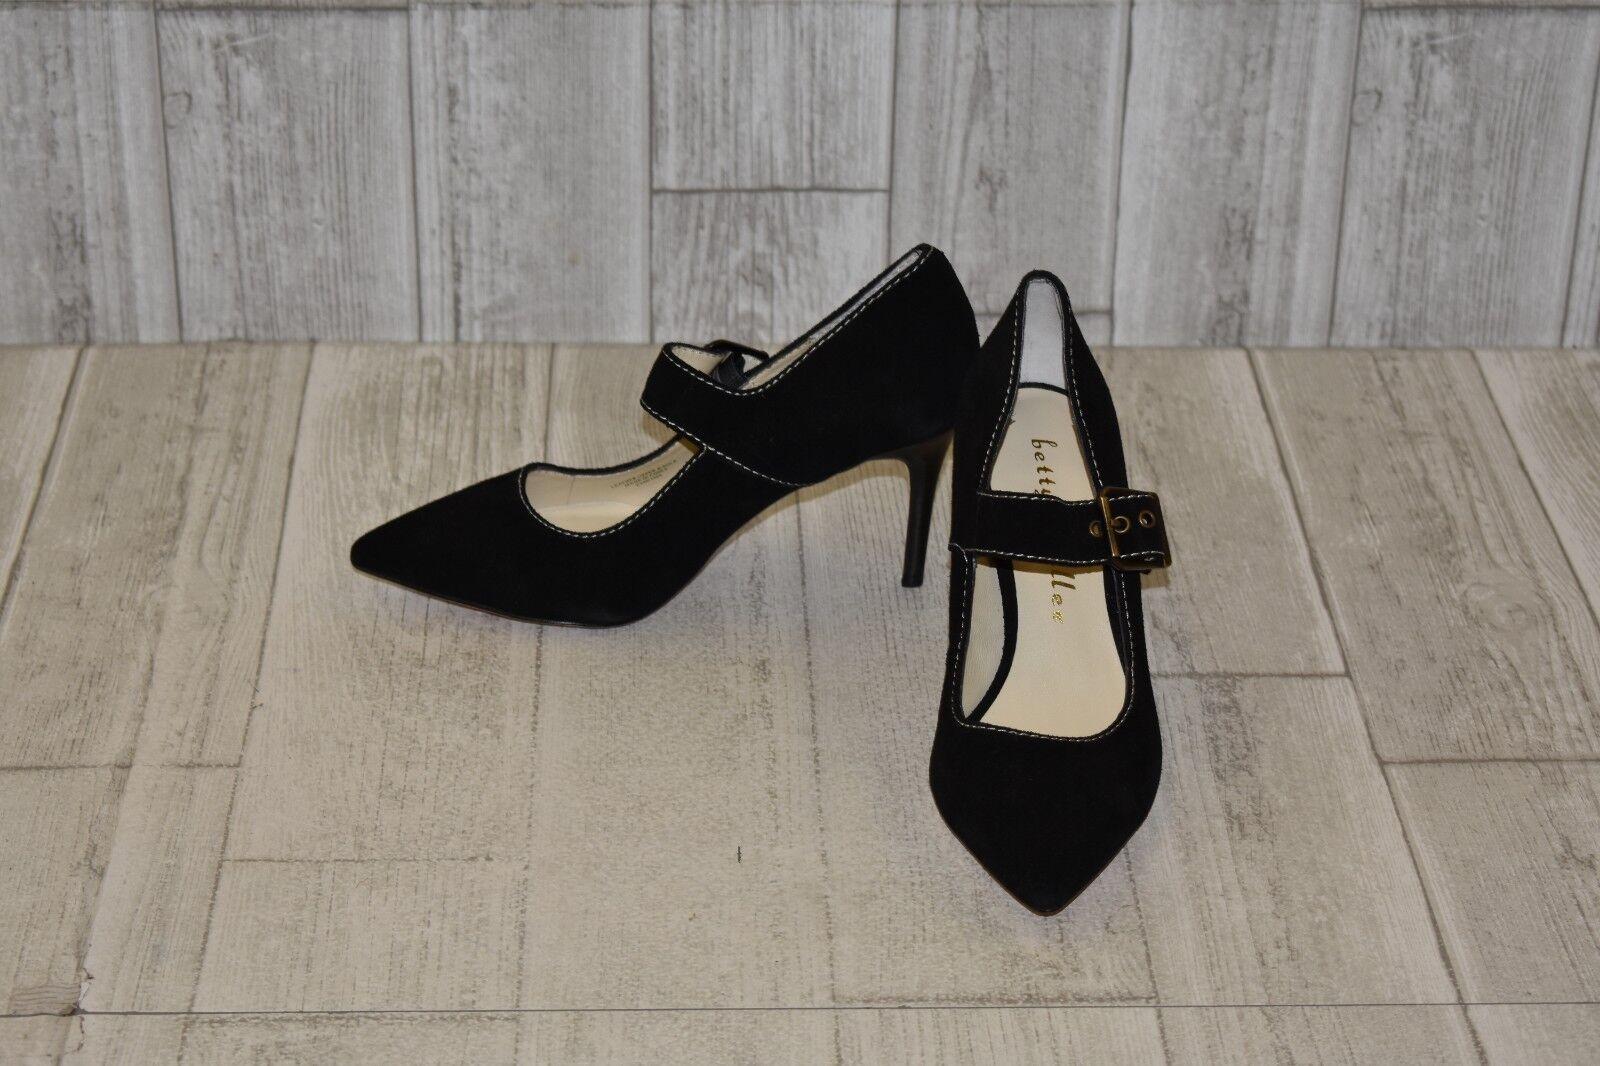 Bettye Muller Gibbs Heels, Women's Size 7.5 M, Black